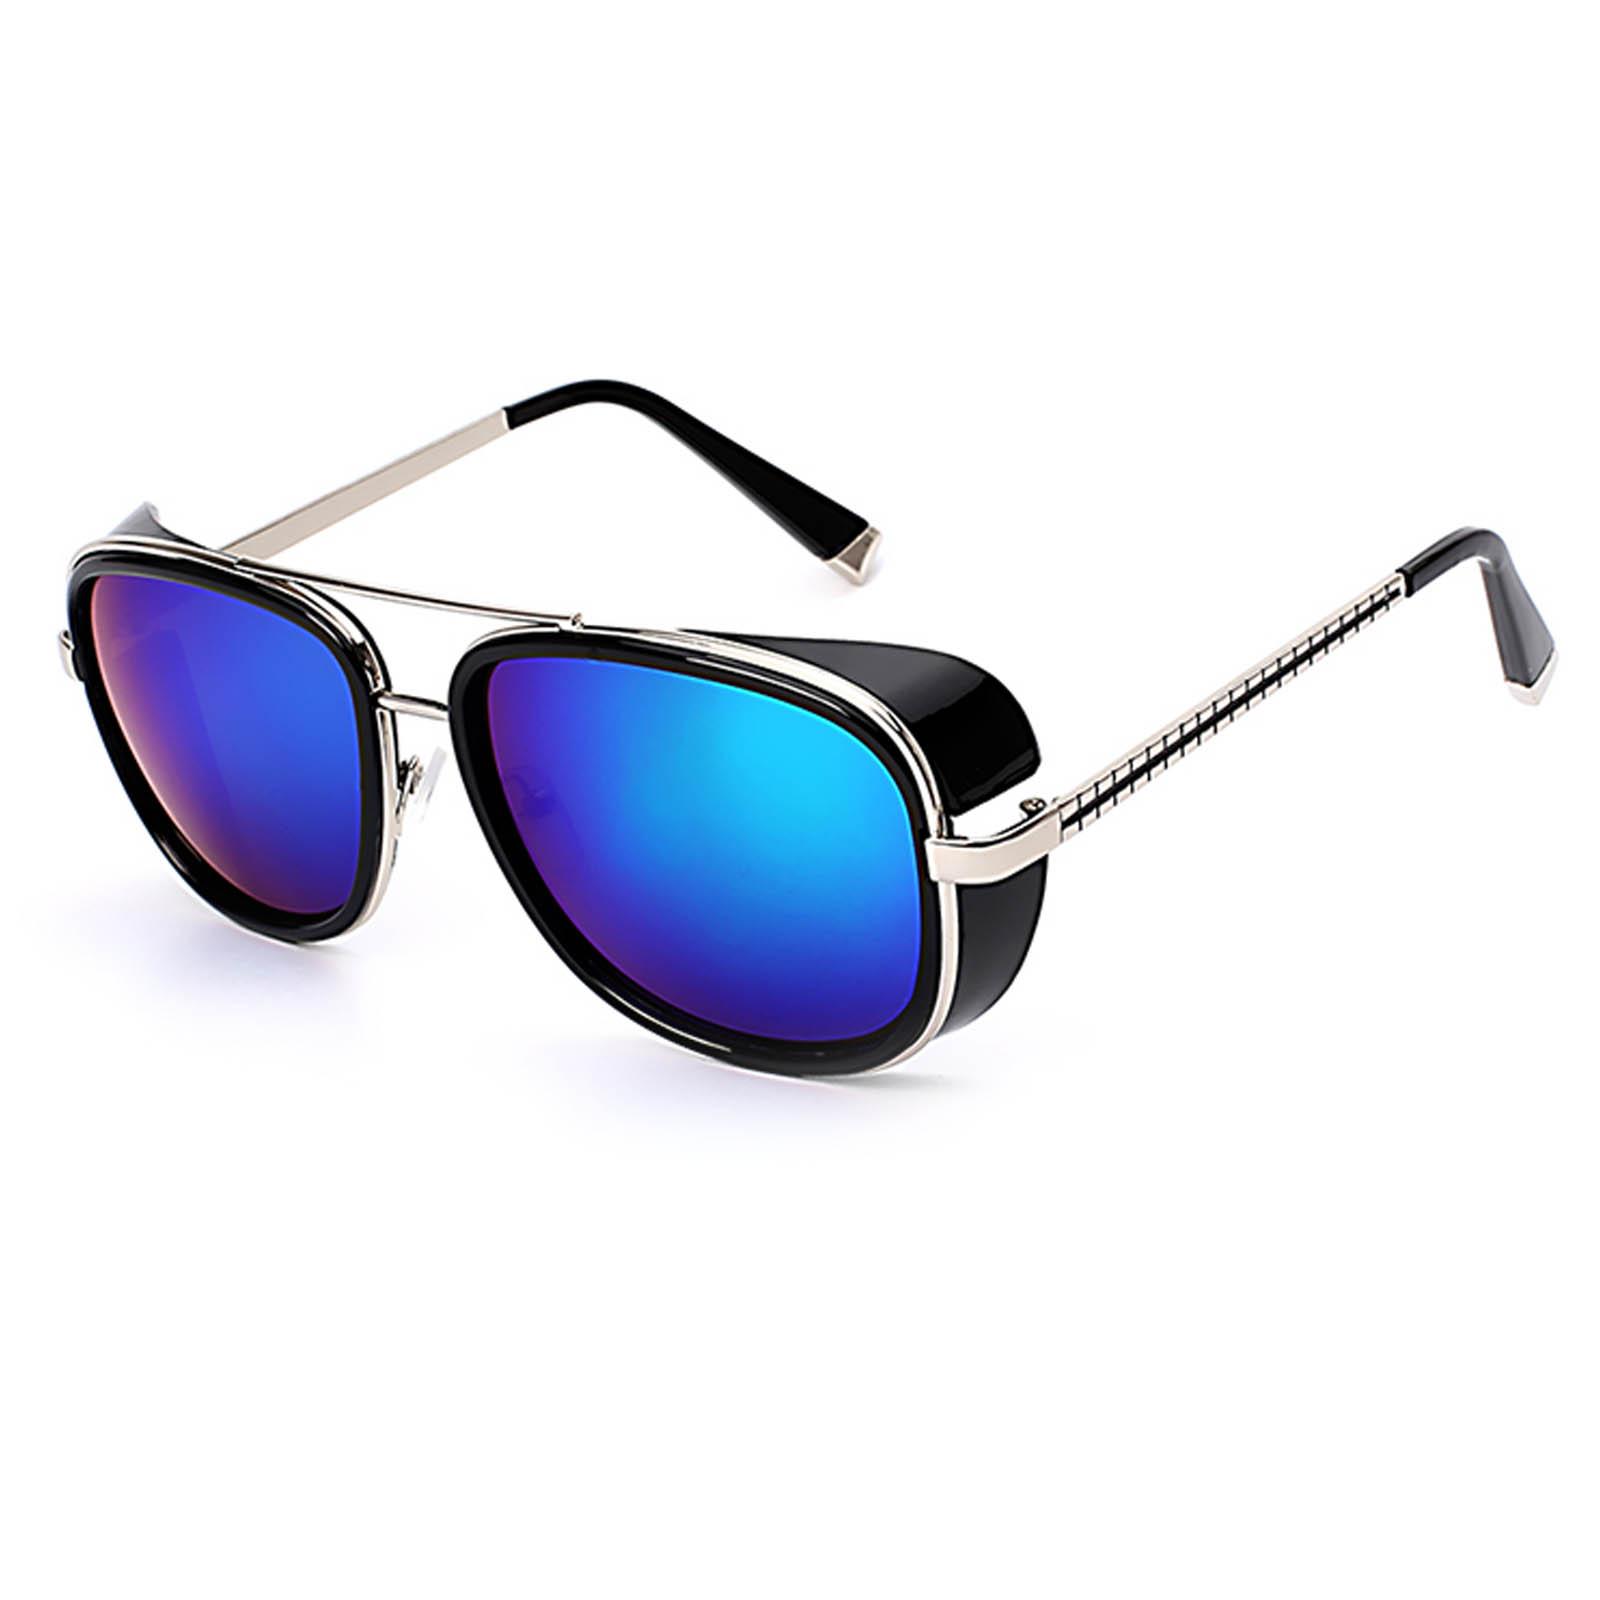 OWL ® 002 C9 Aviator Eyewear Sunglasses Women's Men's Metal Black Frame Green Lens One Pair